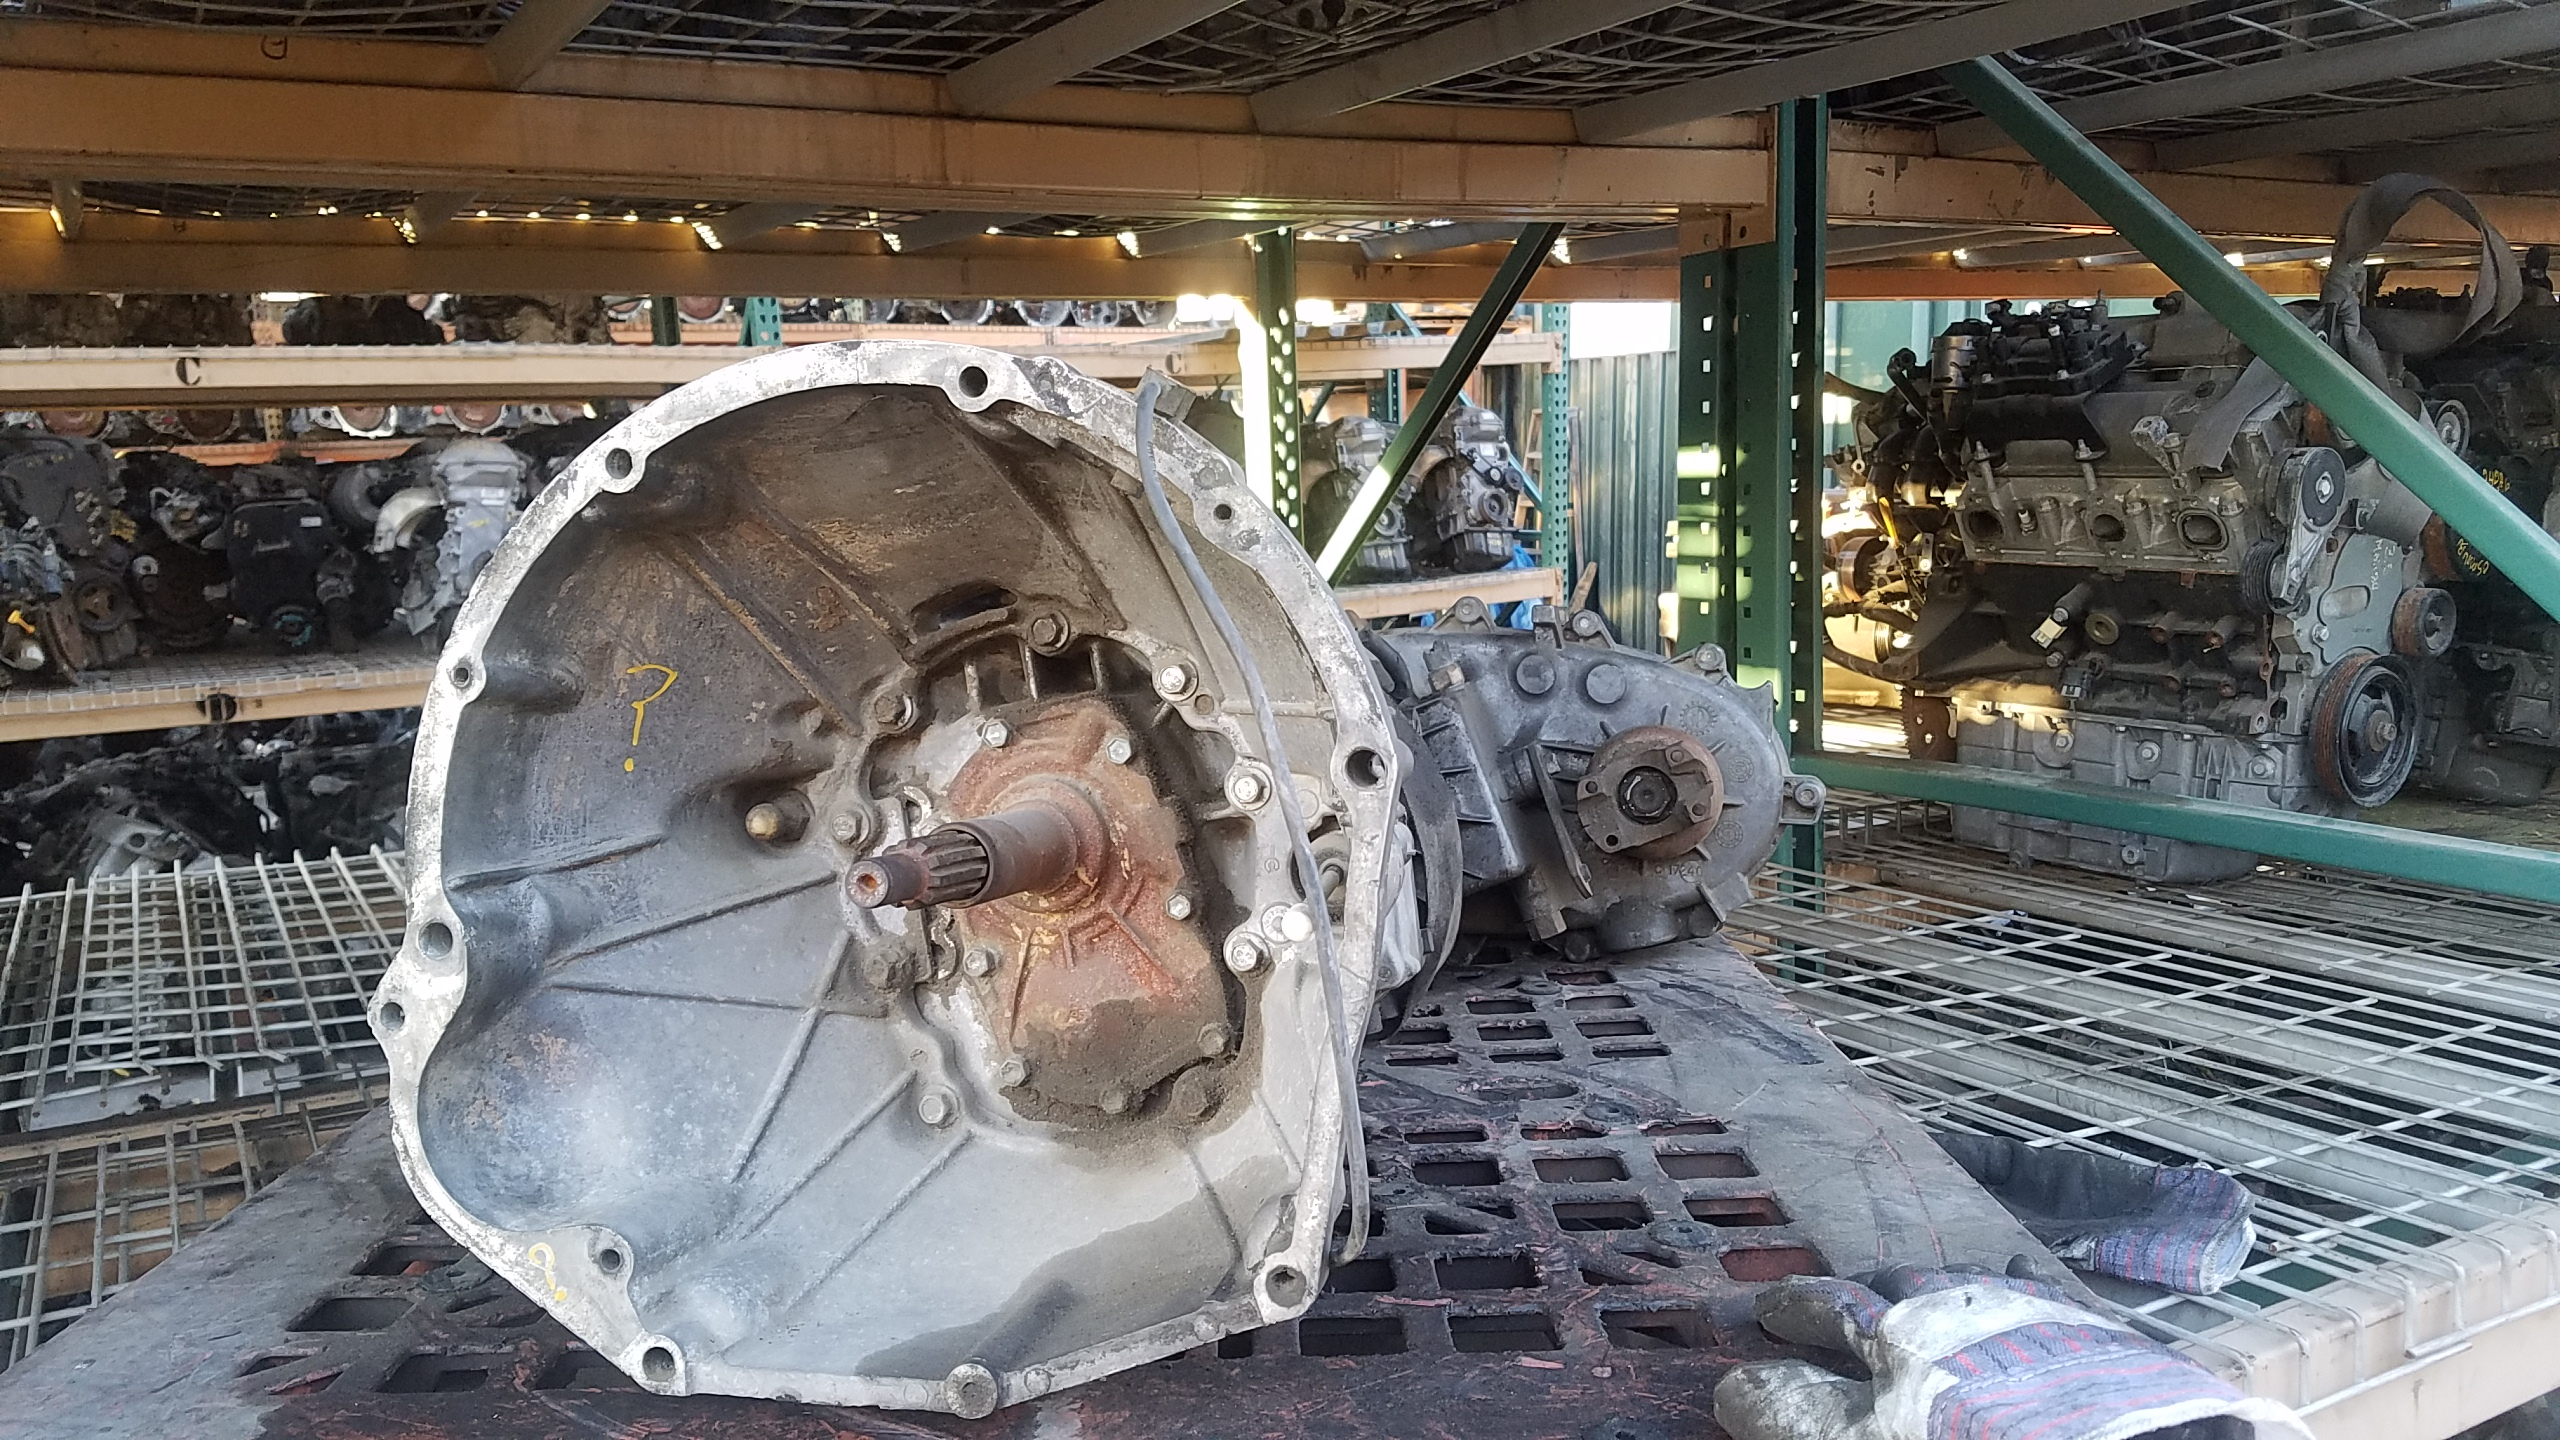 Identifying A 40l Jeep Engine Ax15 Transmission And Np249j 4 0l Bellhousing Diagram 20161129 160456